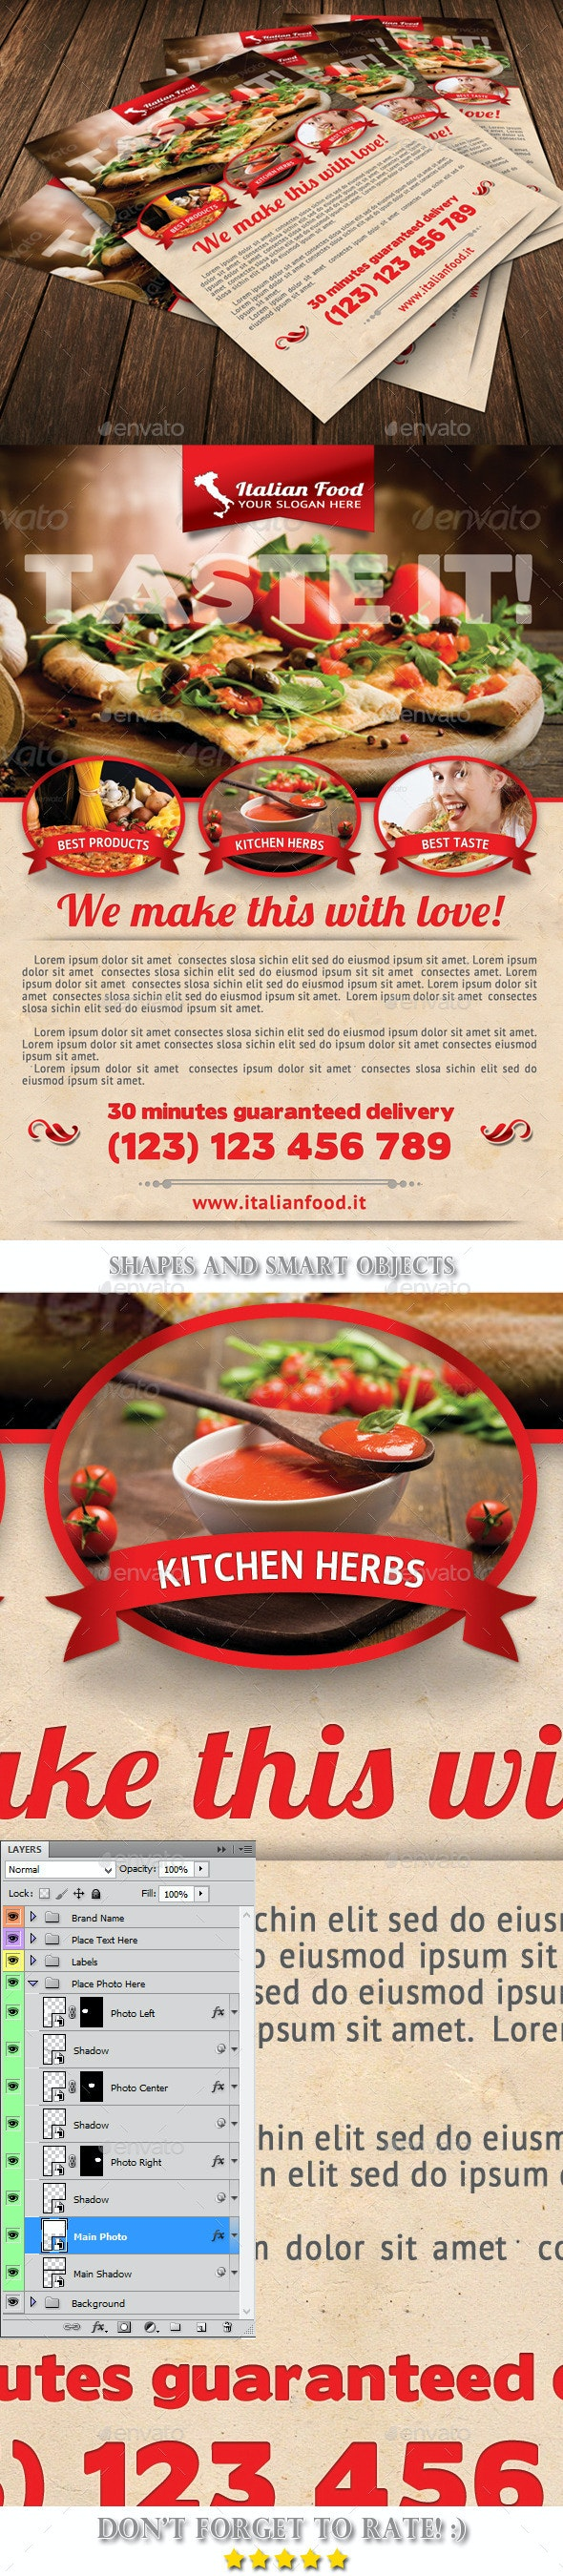 Italian Food Flyer Template 42 - Restaurant Flyers